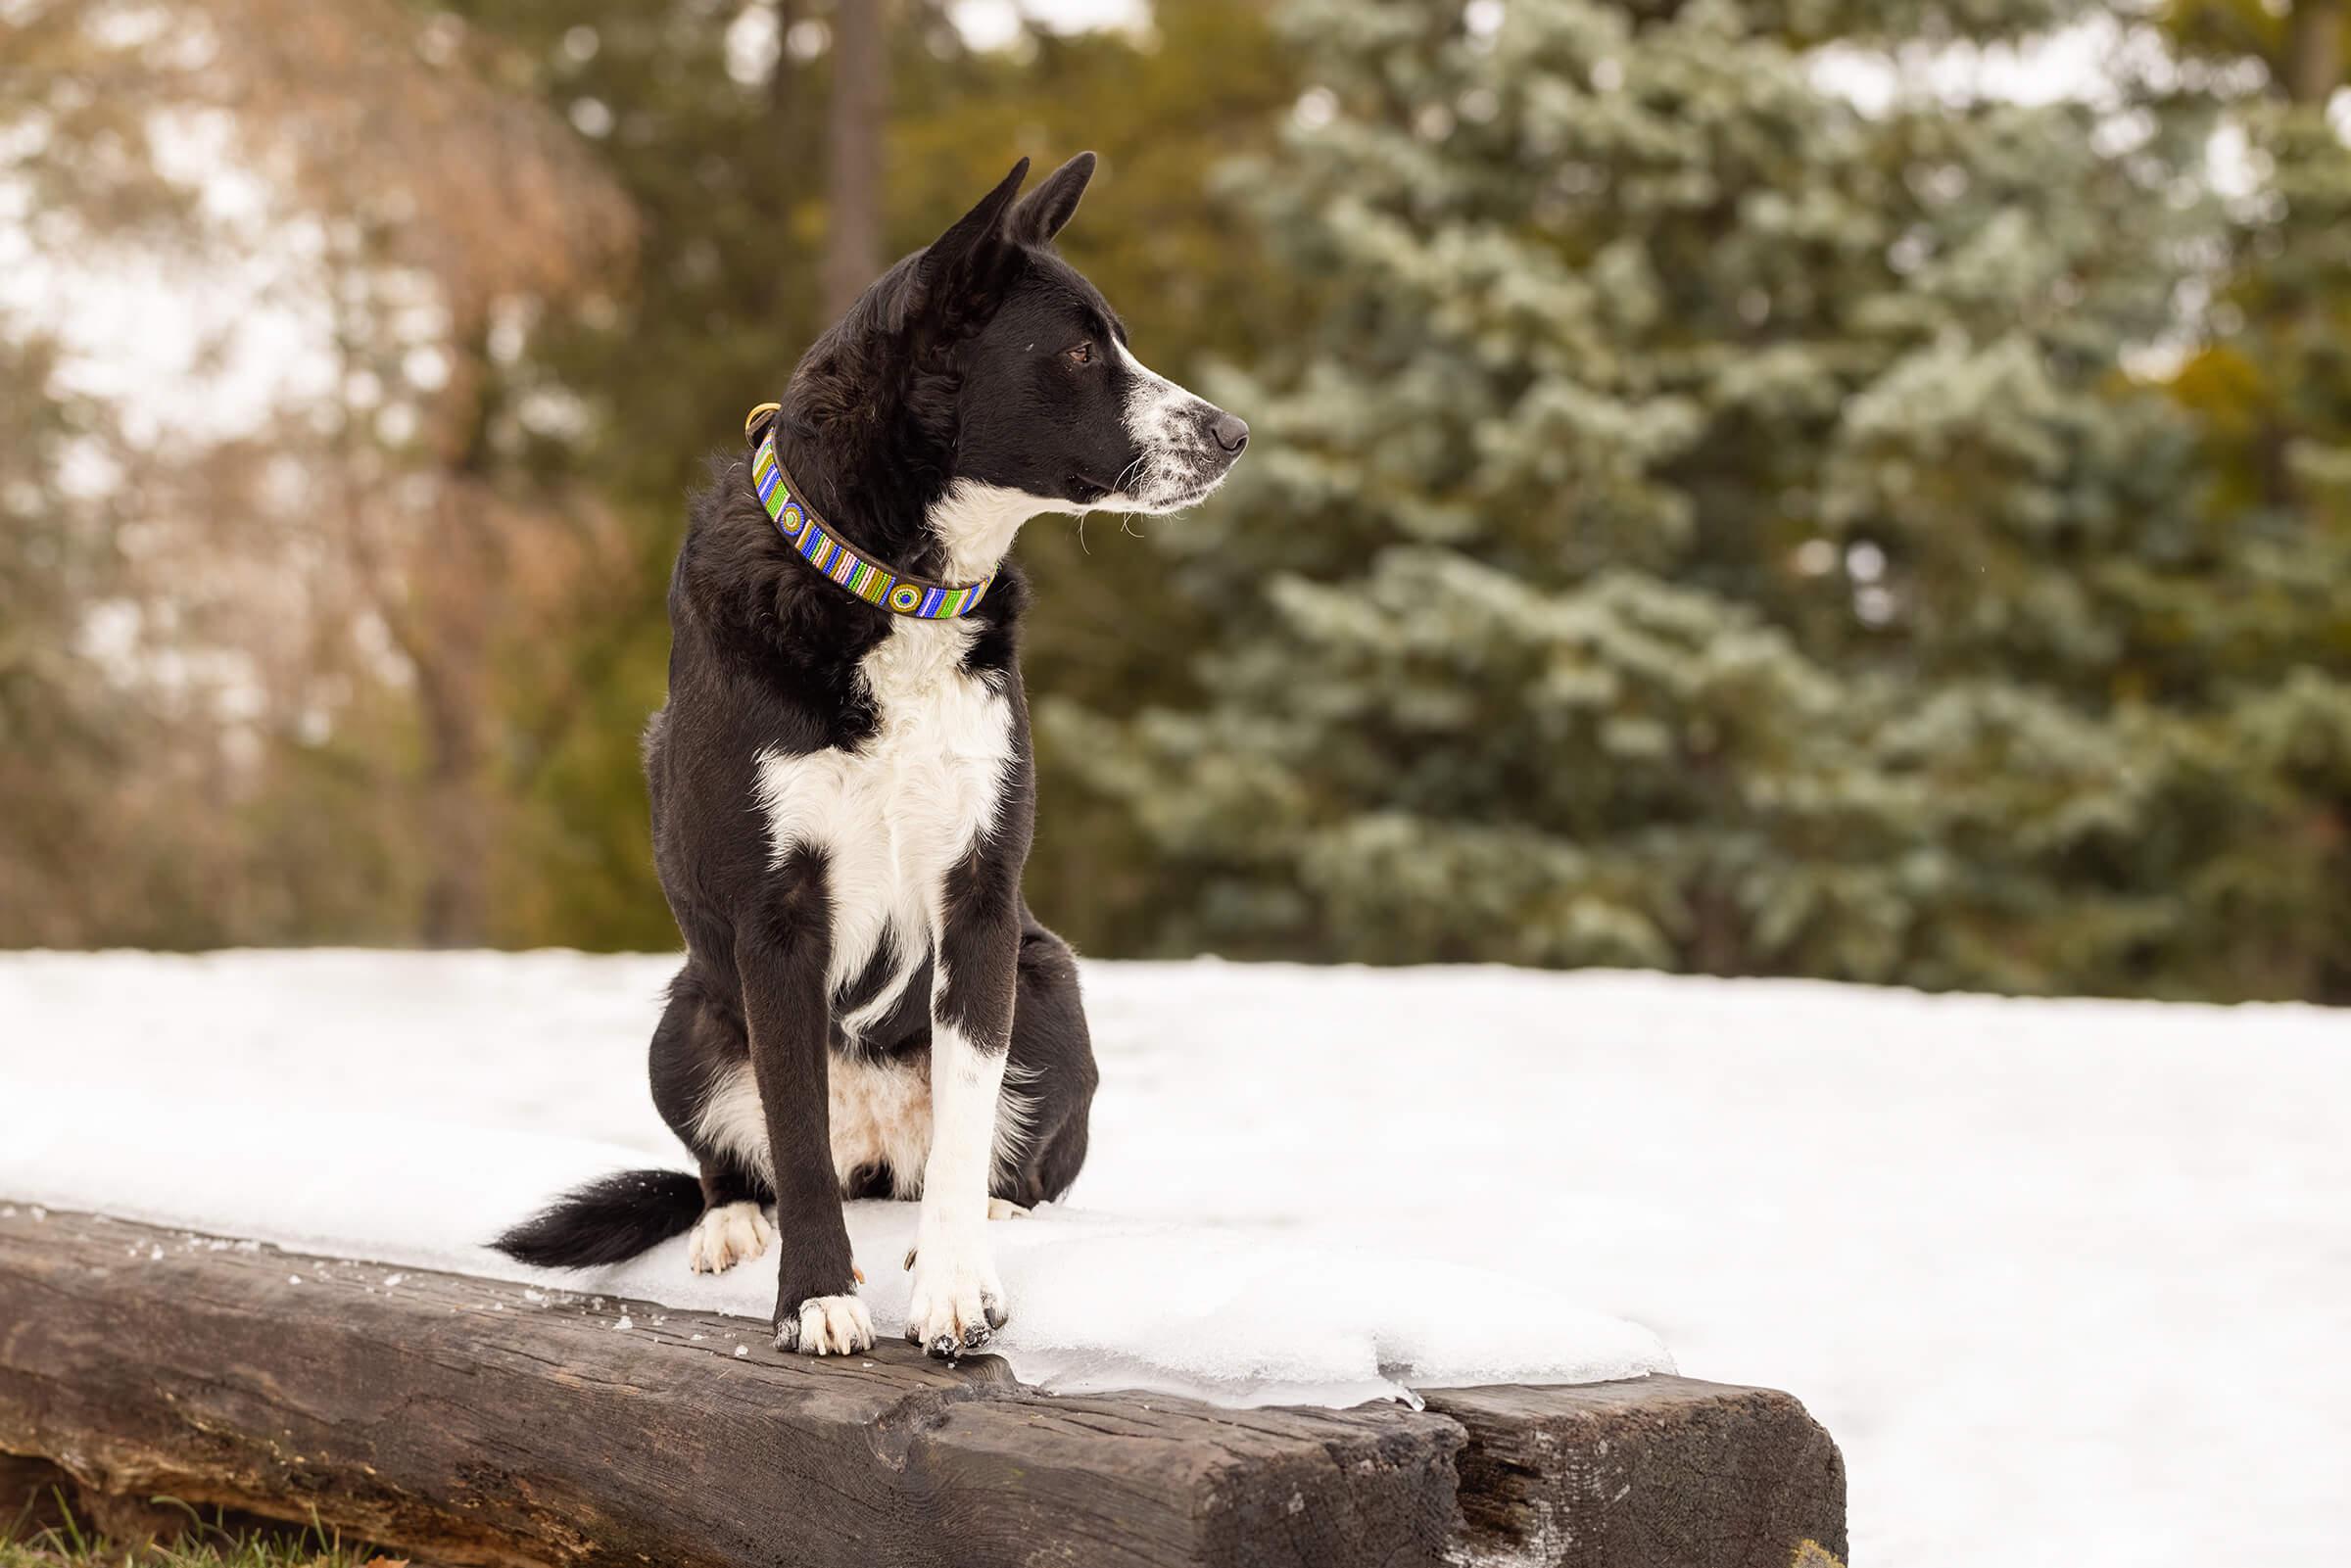 dog sitting on snow with luxury collar